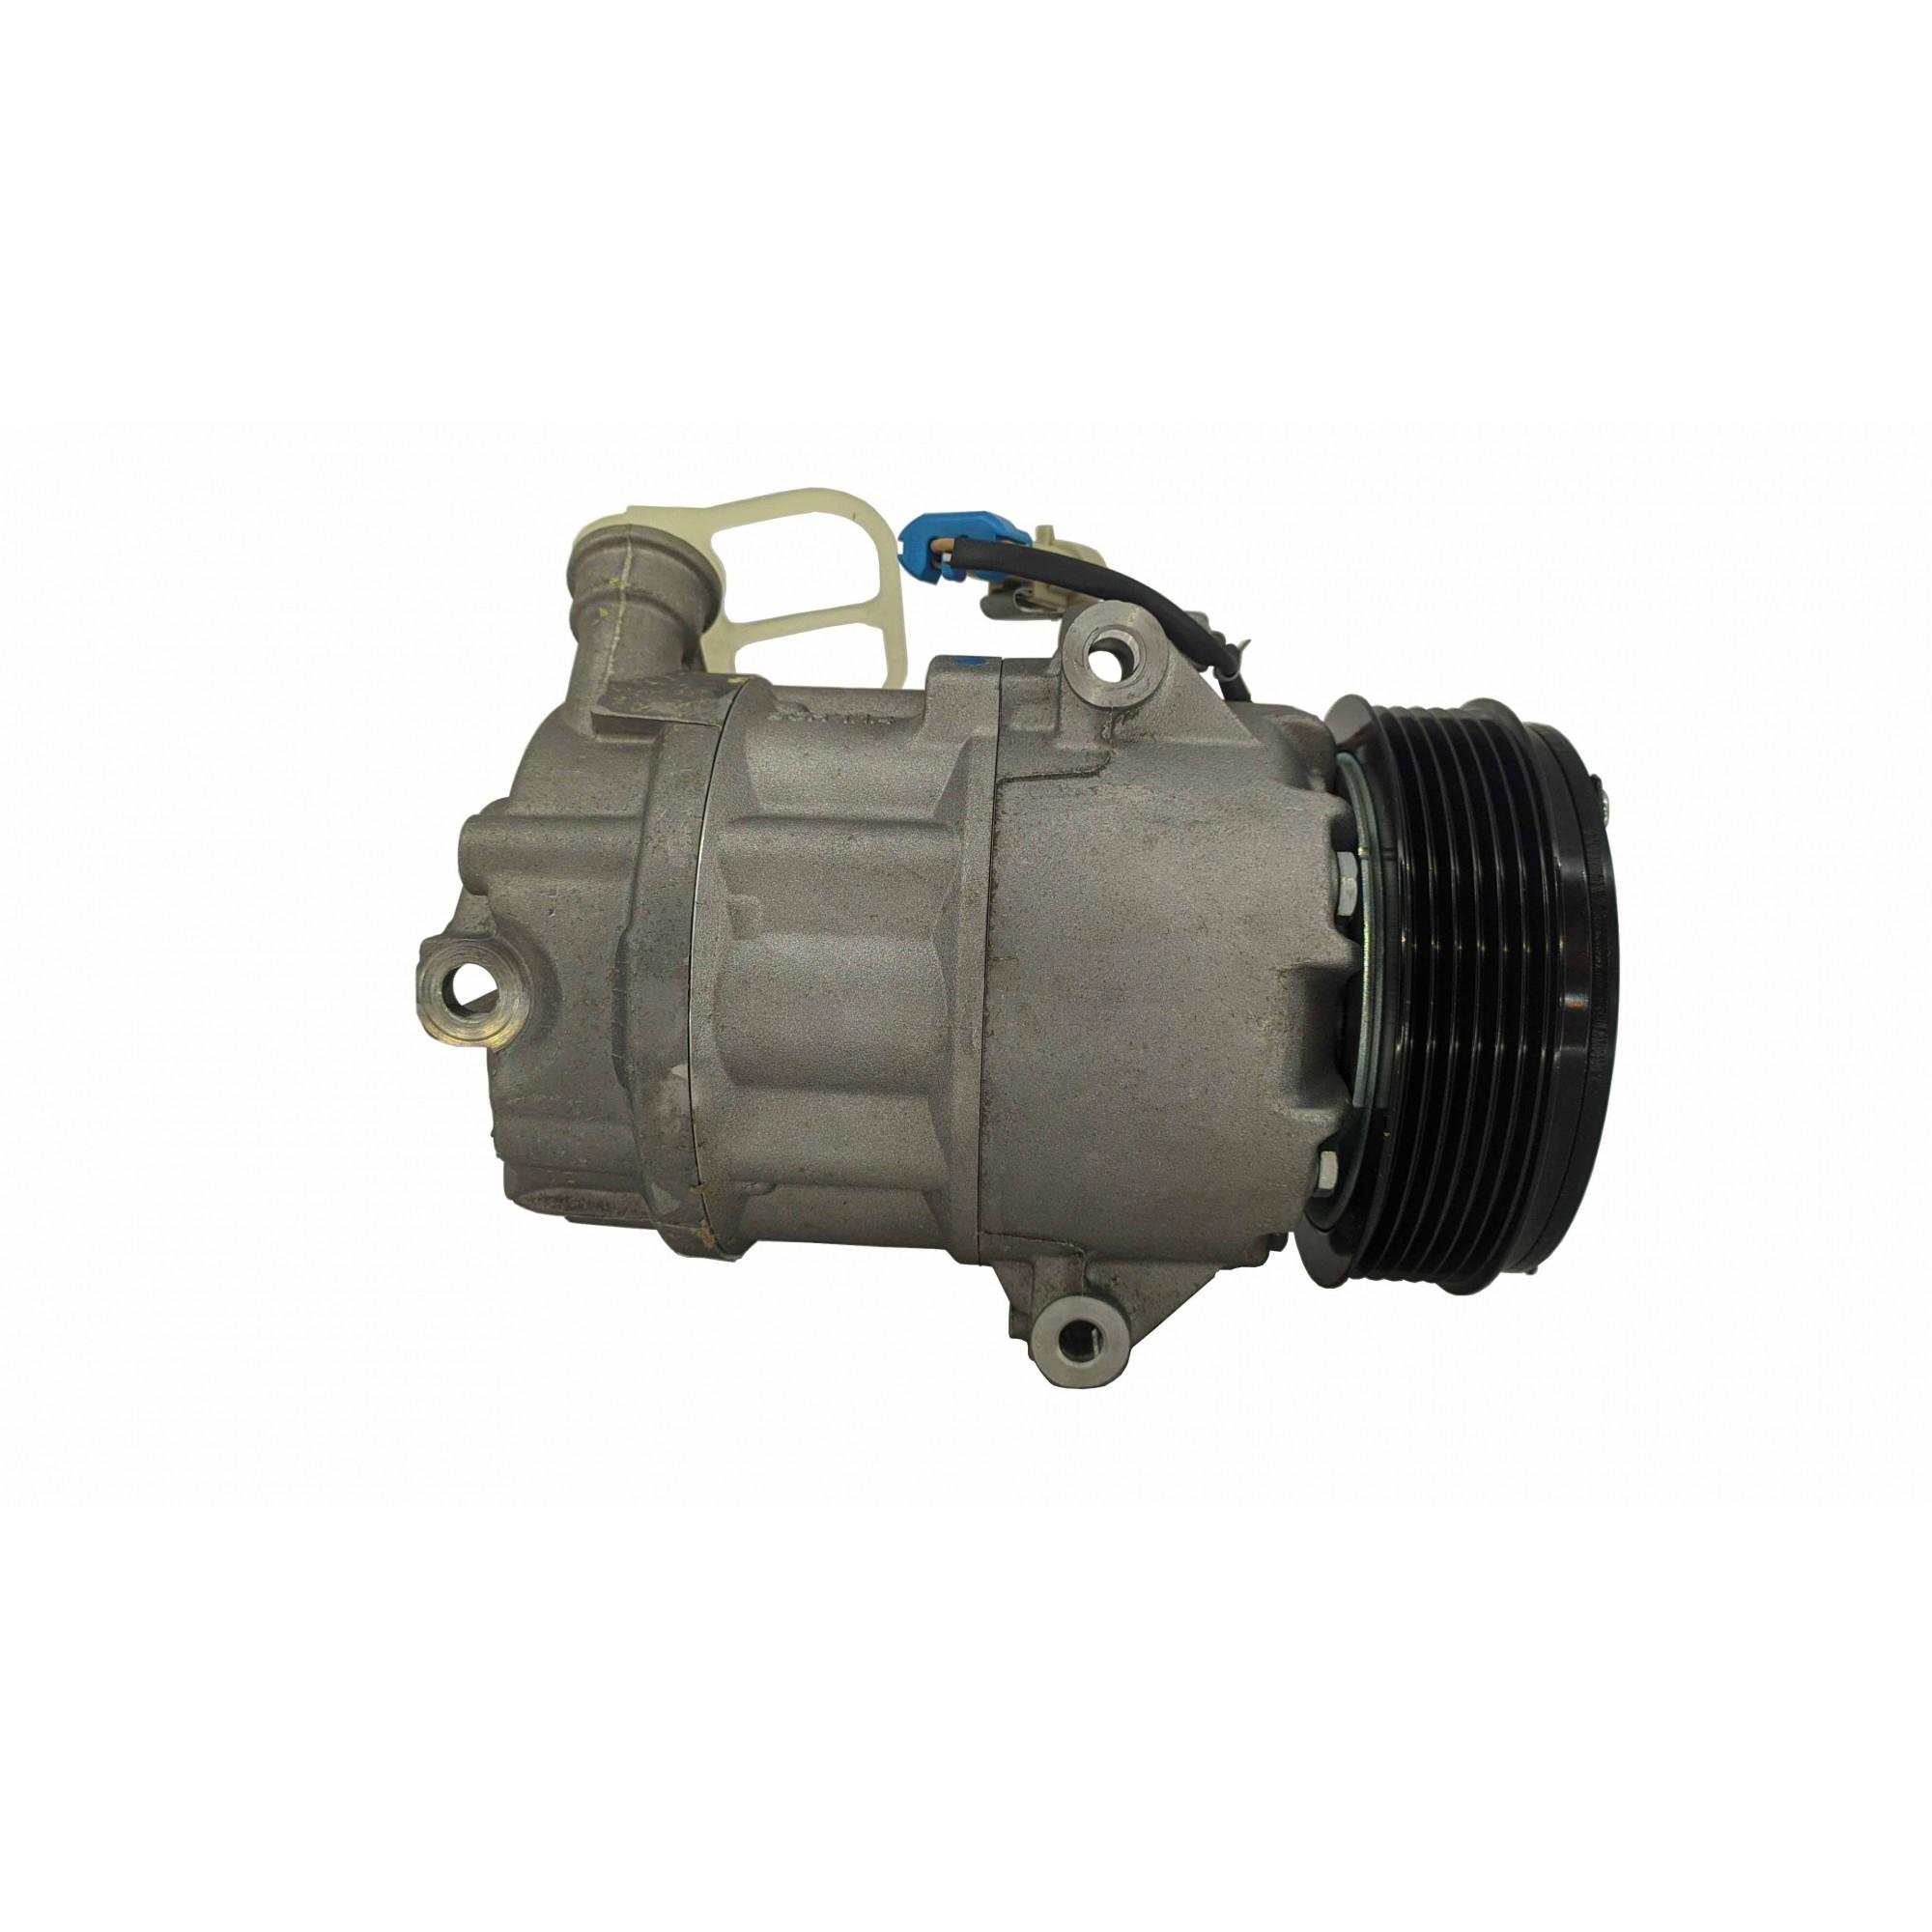 Compressor Astra / Vectra / Zafira - Original MAHLE